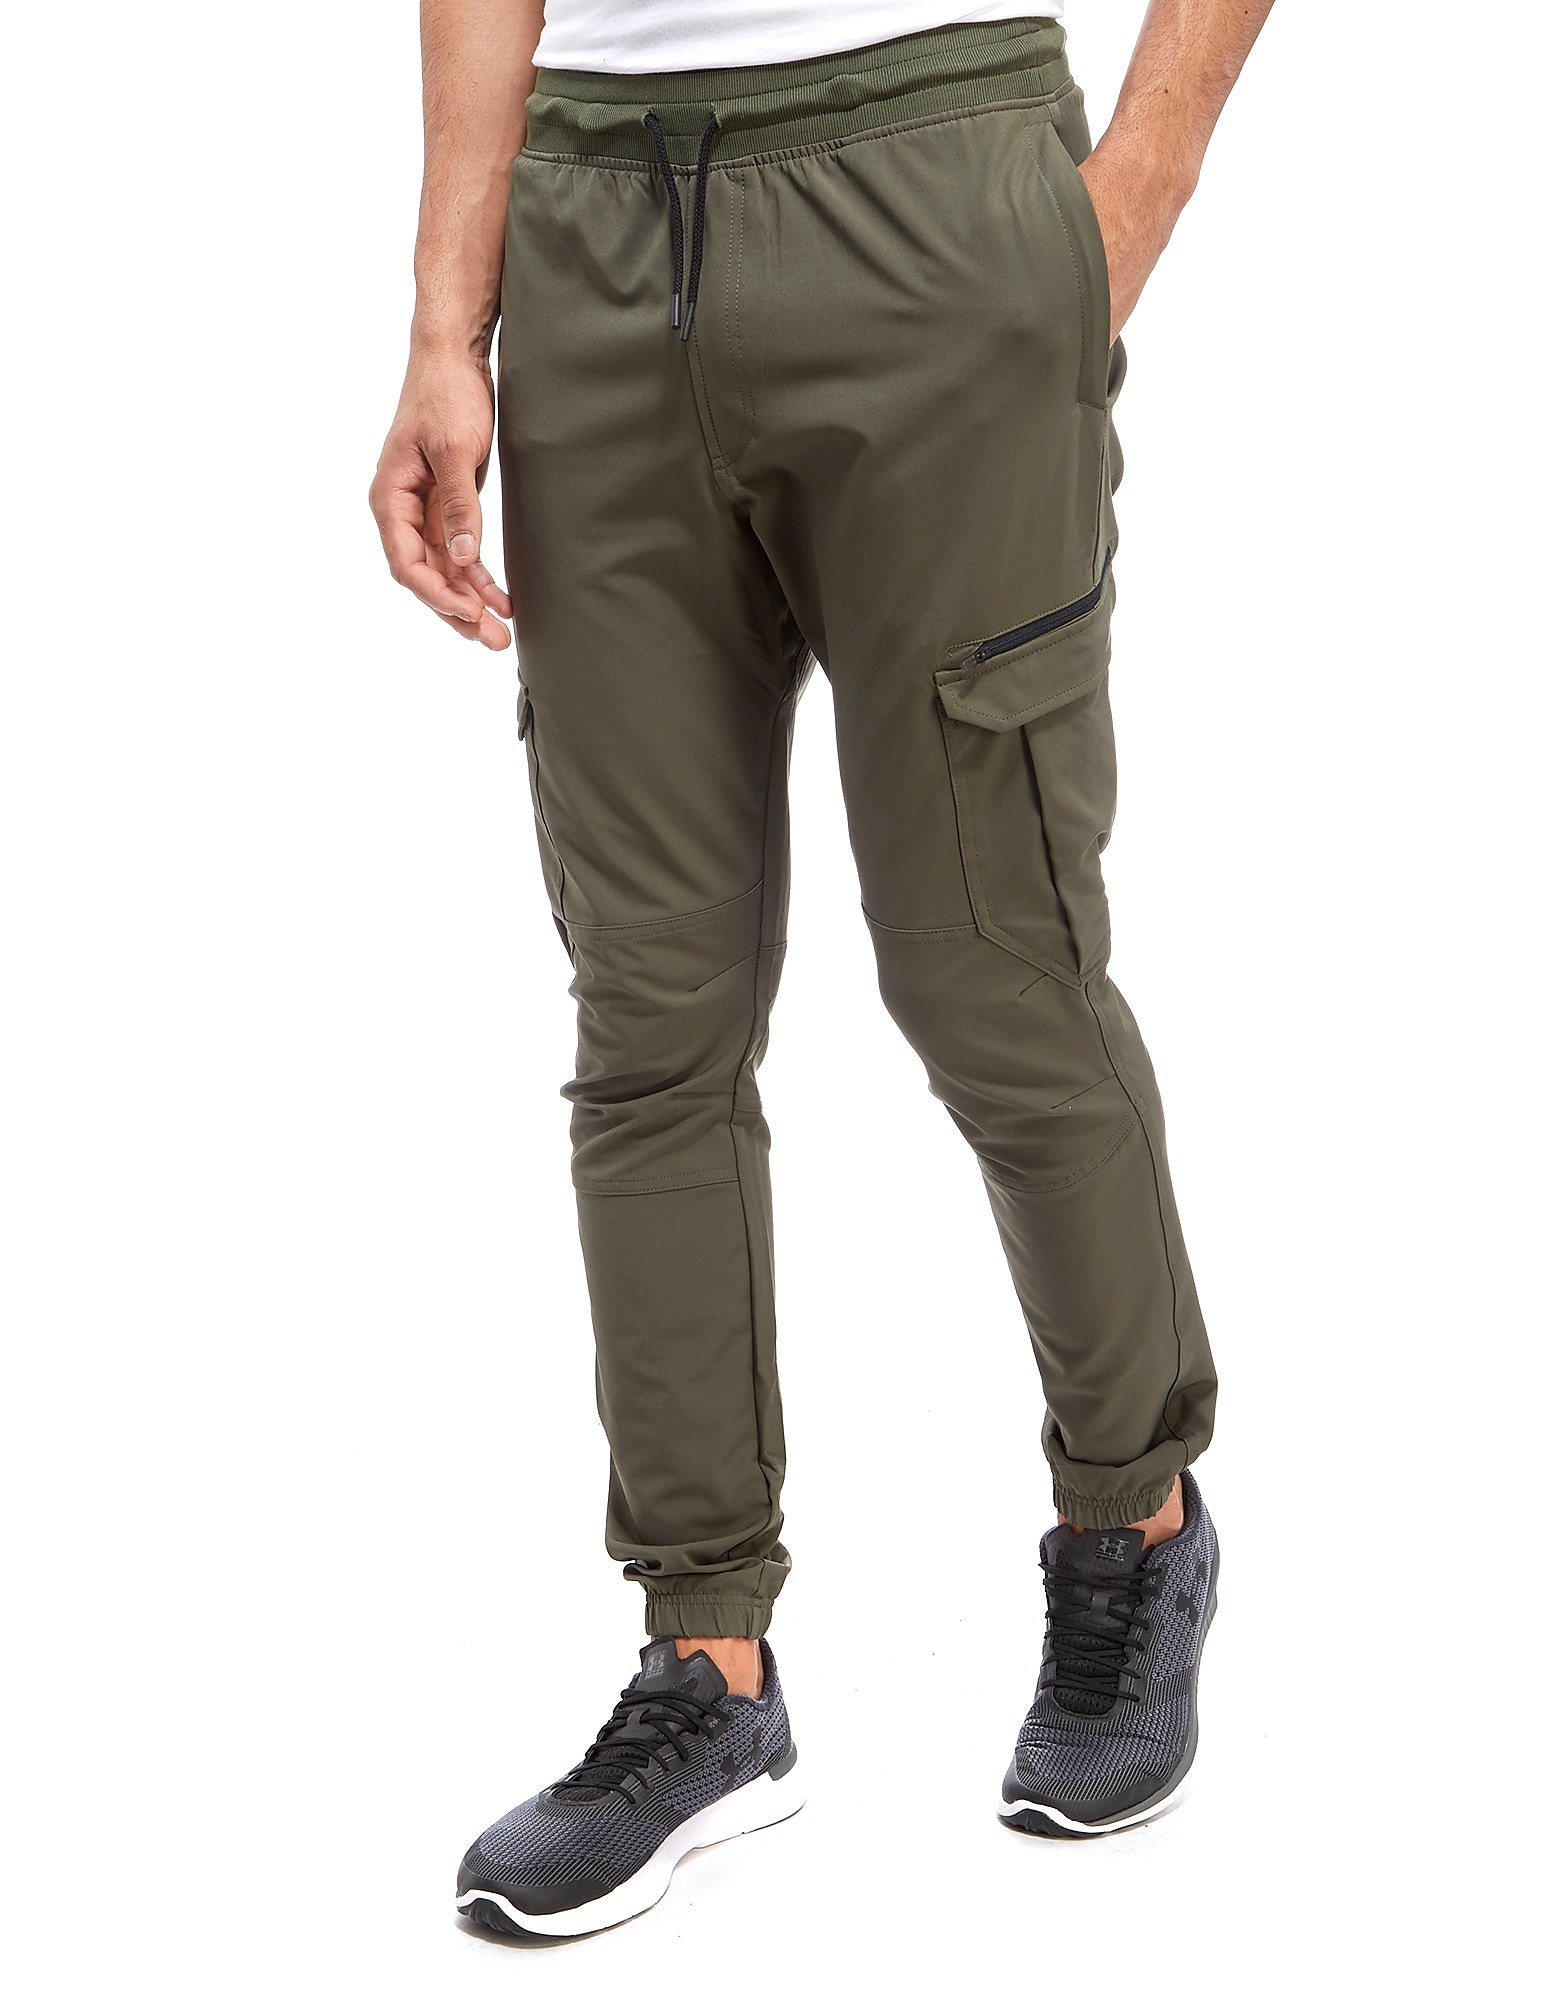 Under Armour Under Armour WG Cargo Pants